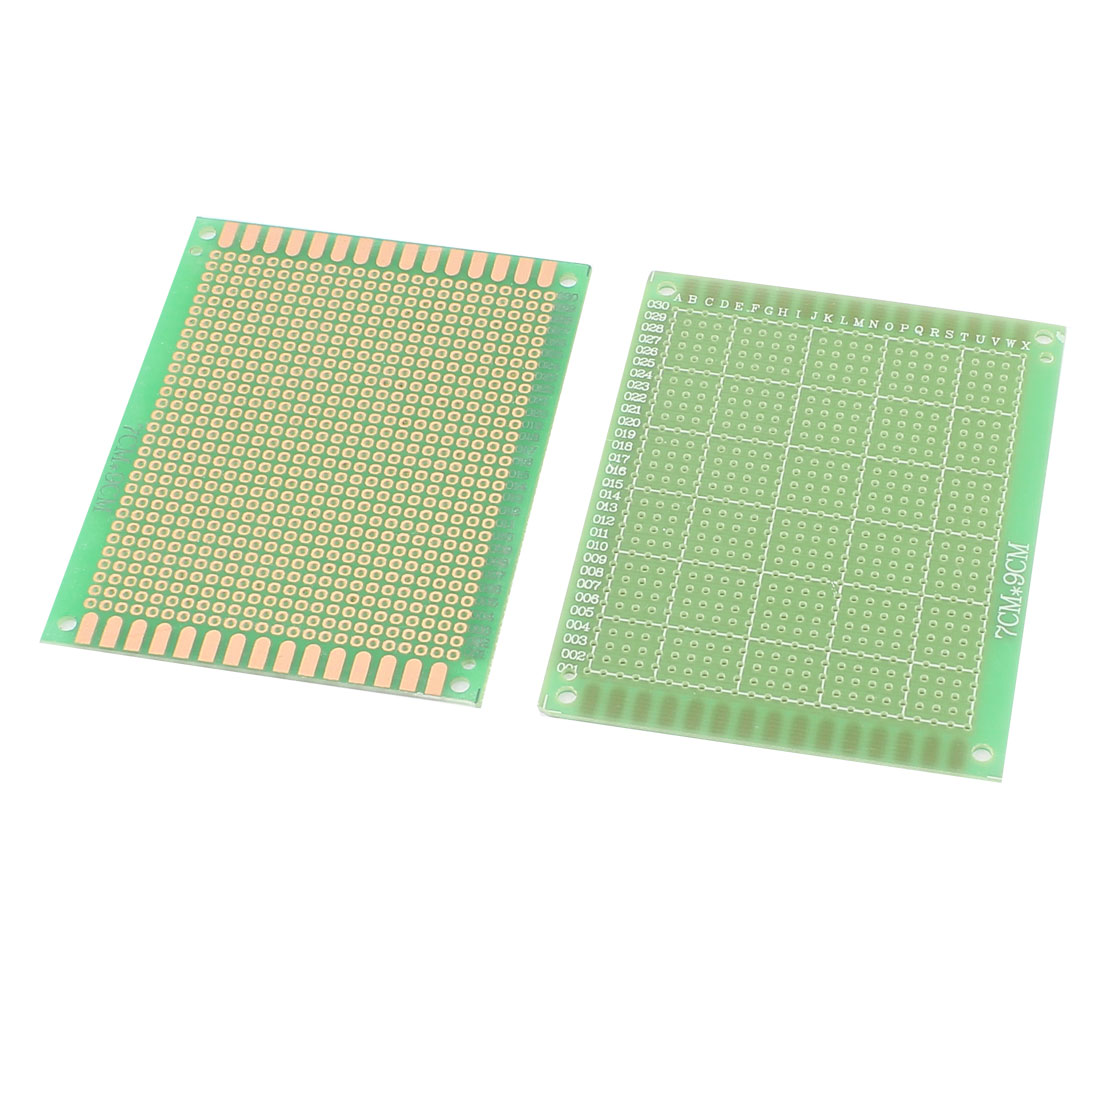 2 Pcs Double Side Prototype Solderable Universal PCB Board 7x9cm